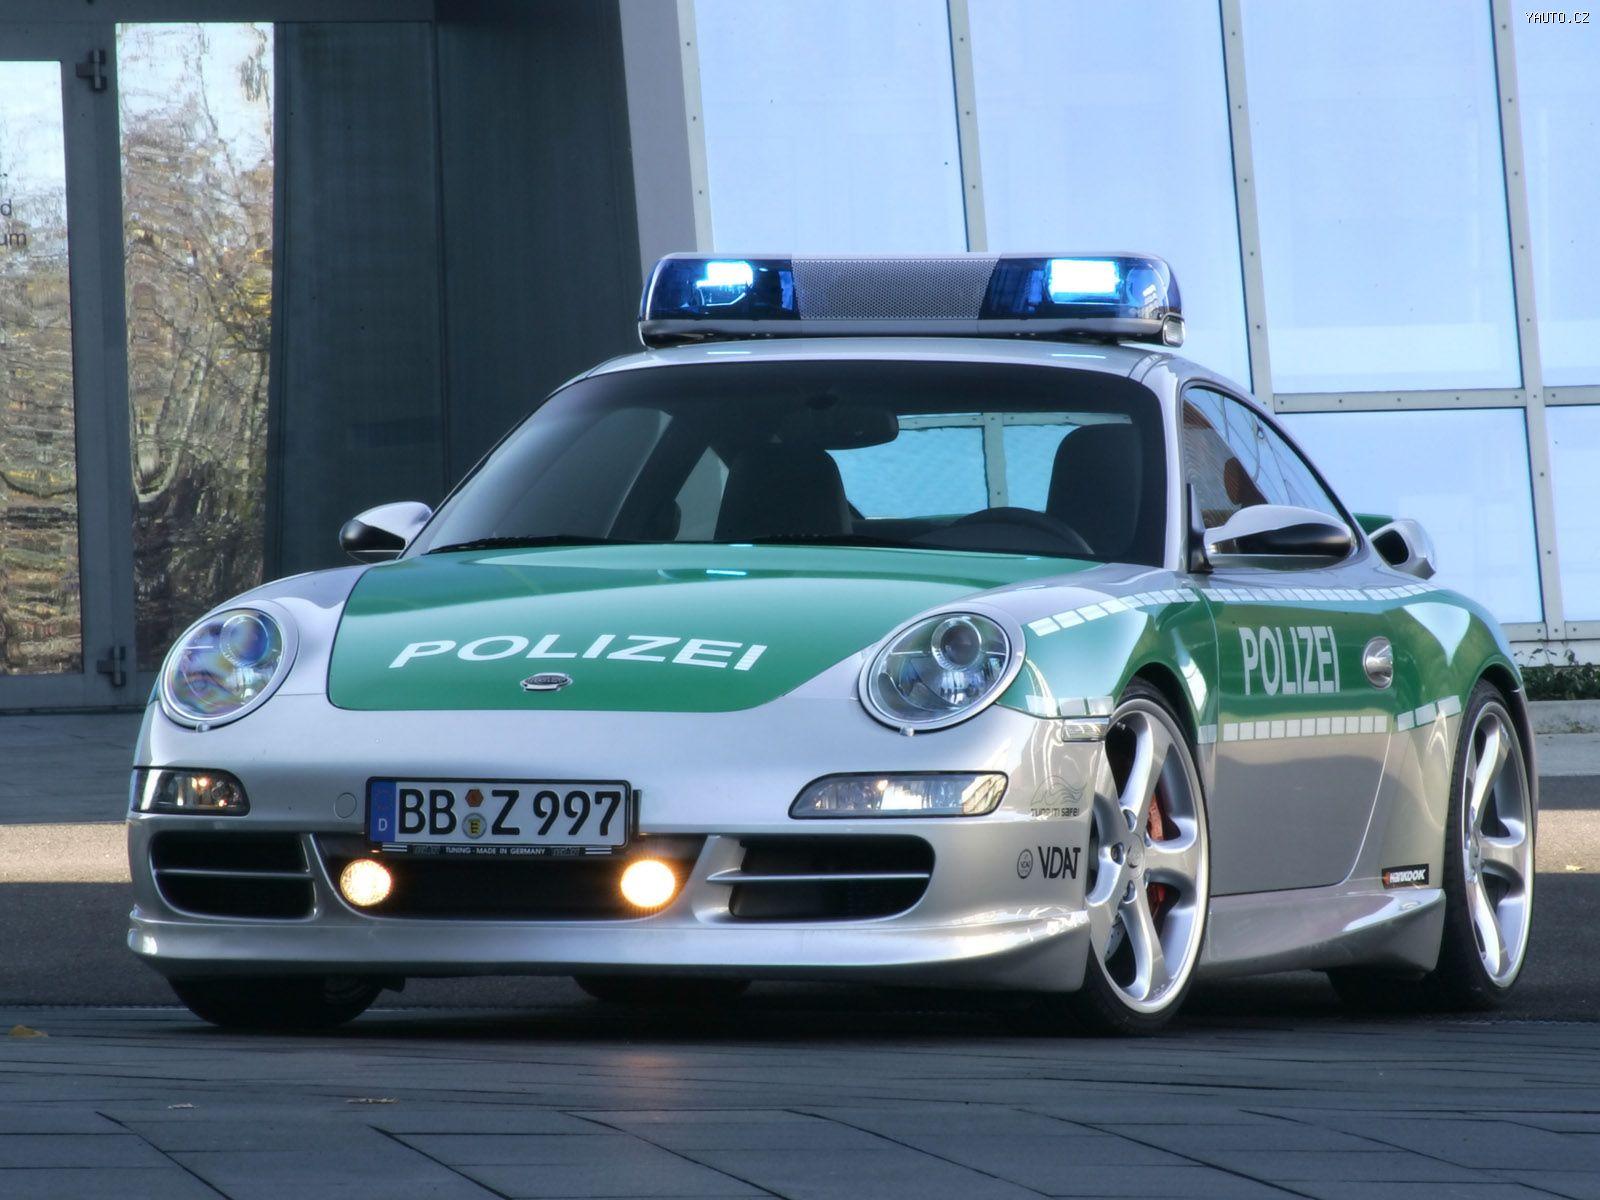 http://img.yauto.cz/tapety/Porsche_911_Carrera_pro_nemeckou_policii_2005_2.jpg